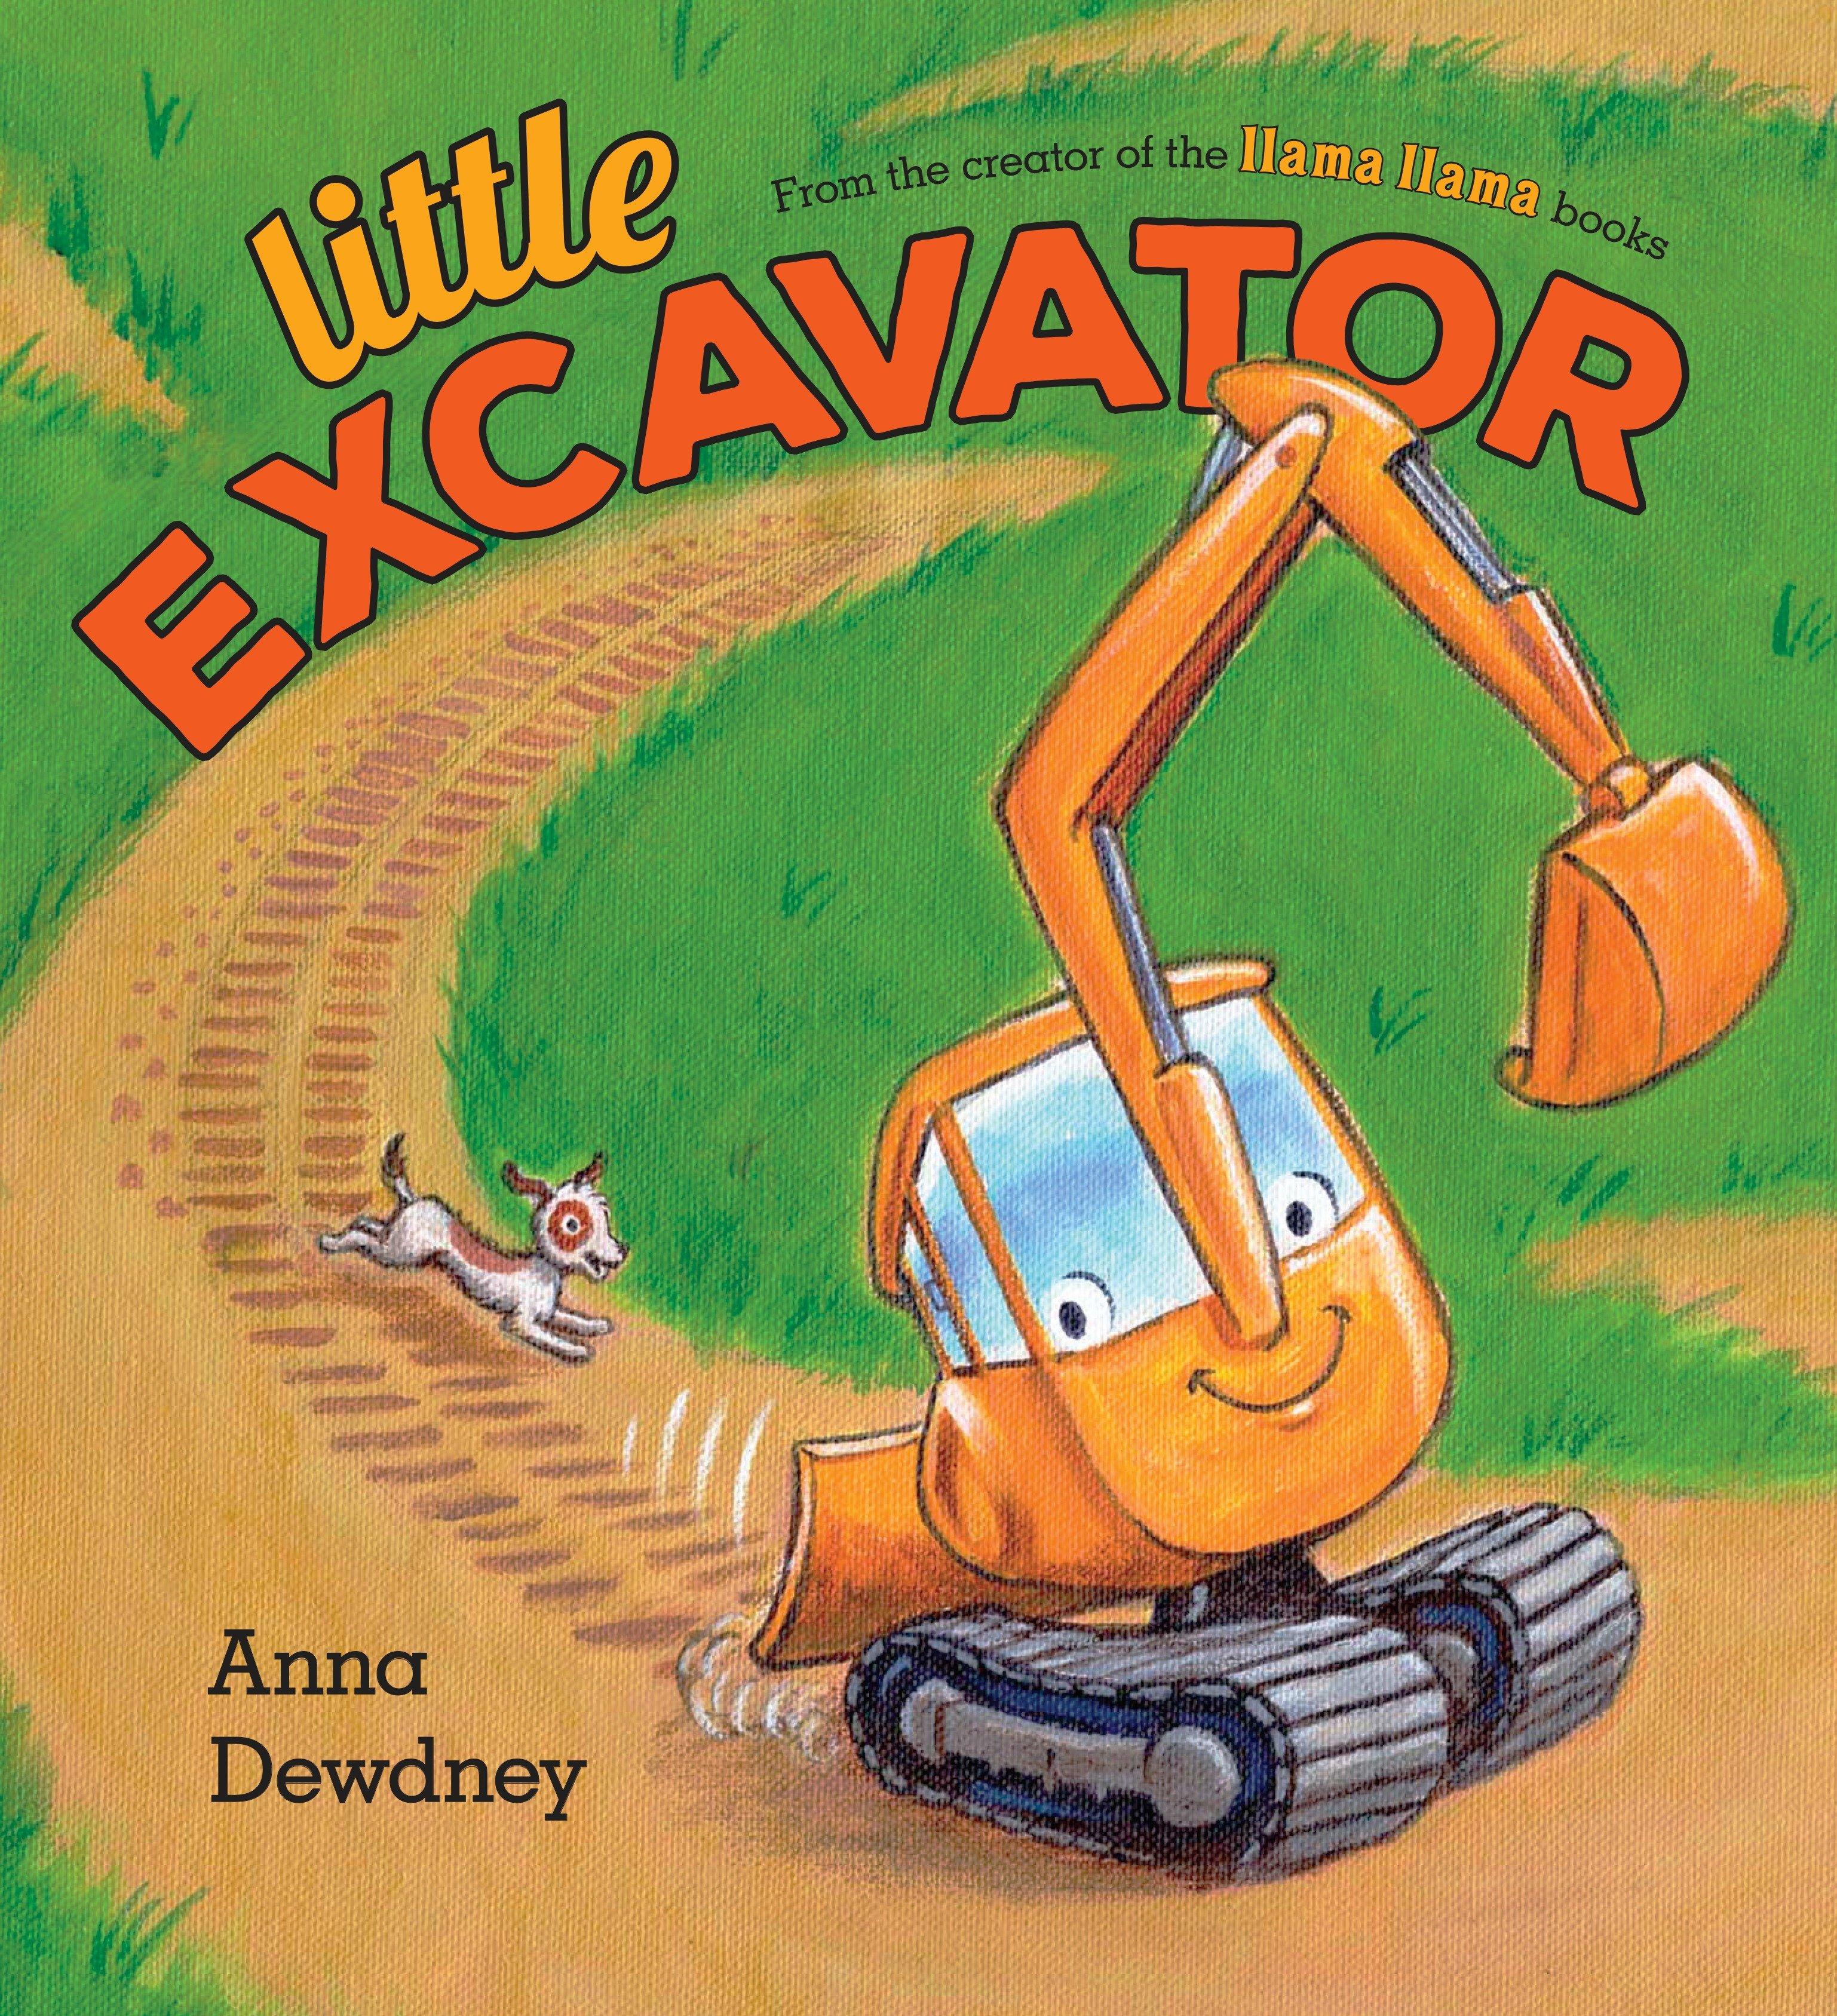 Little Excavator (Hardcover)